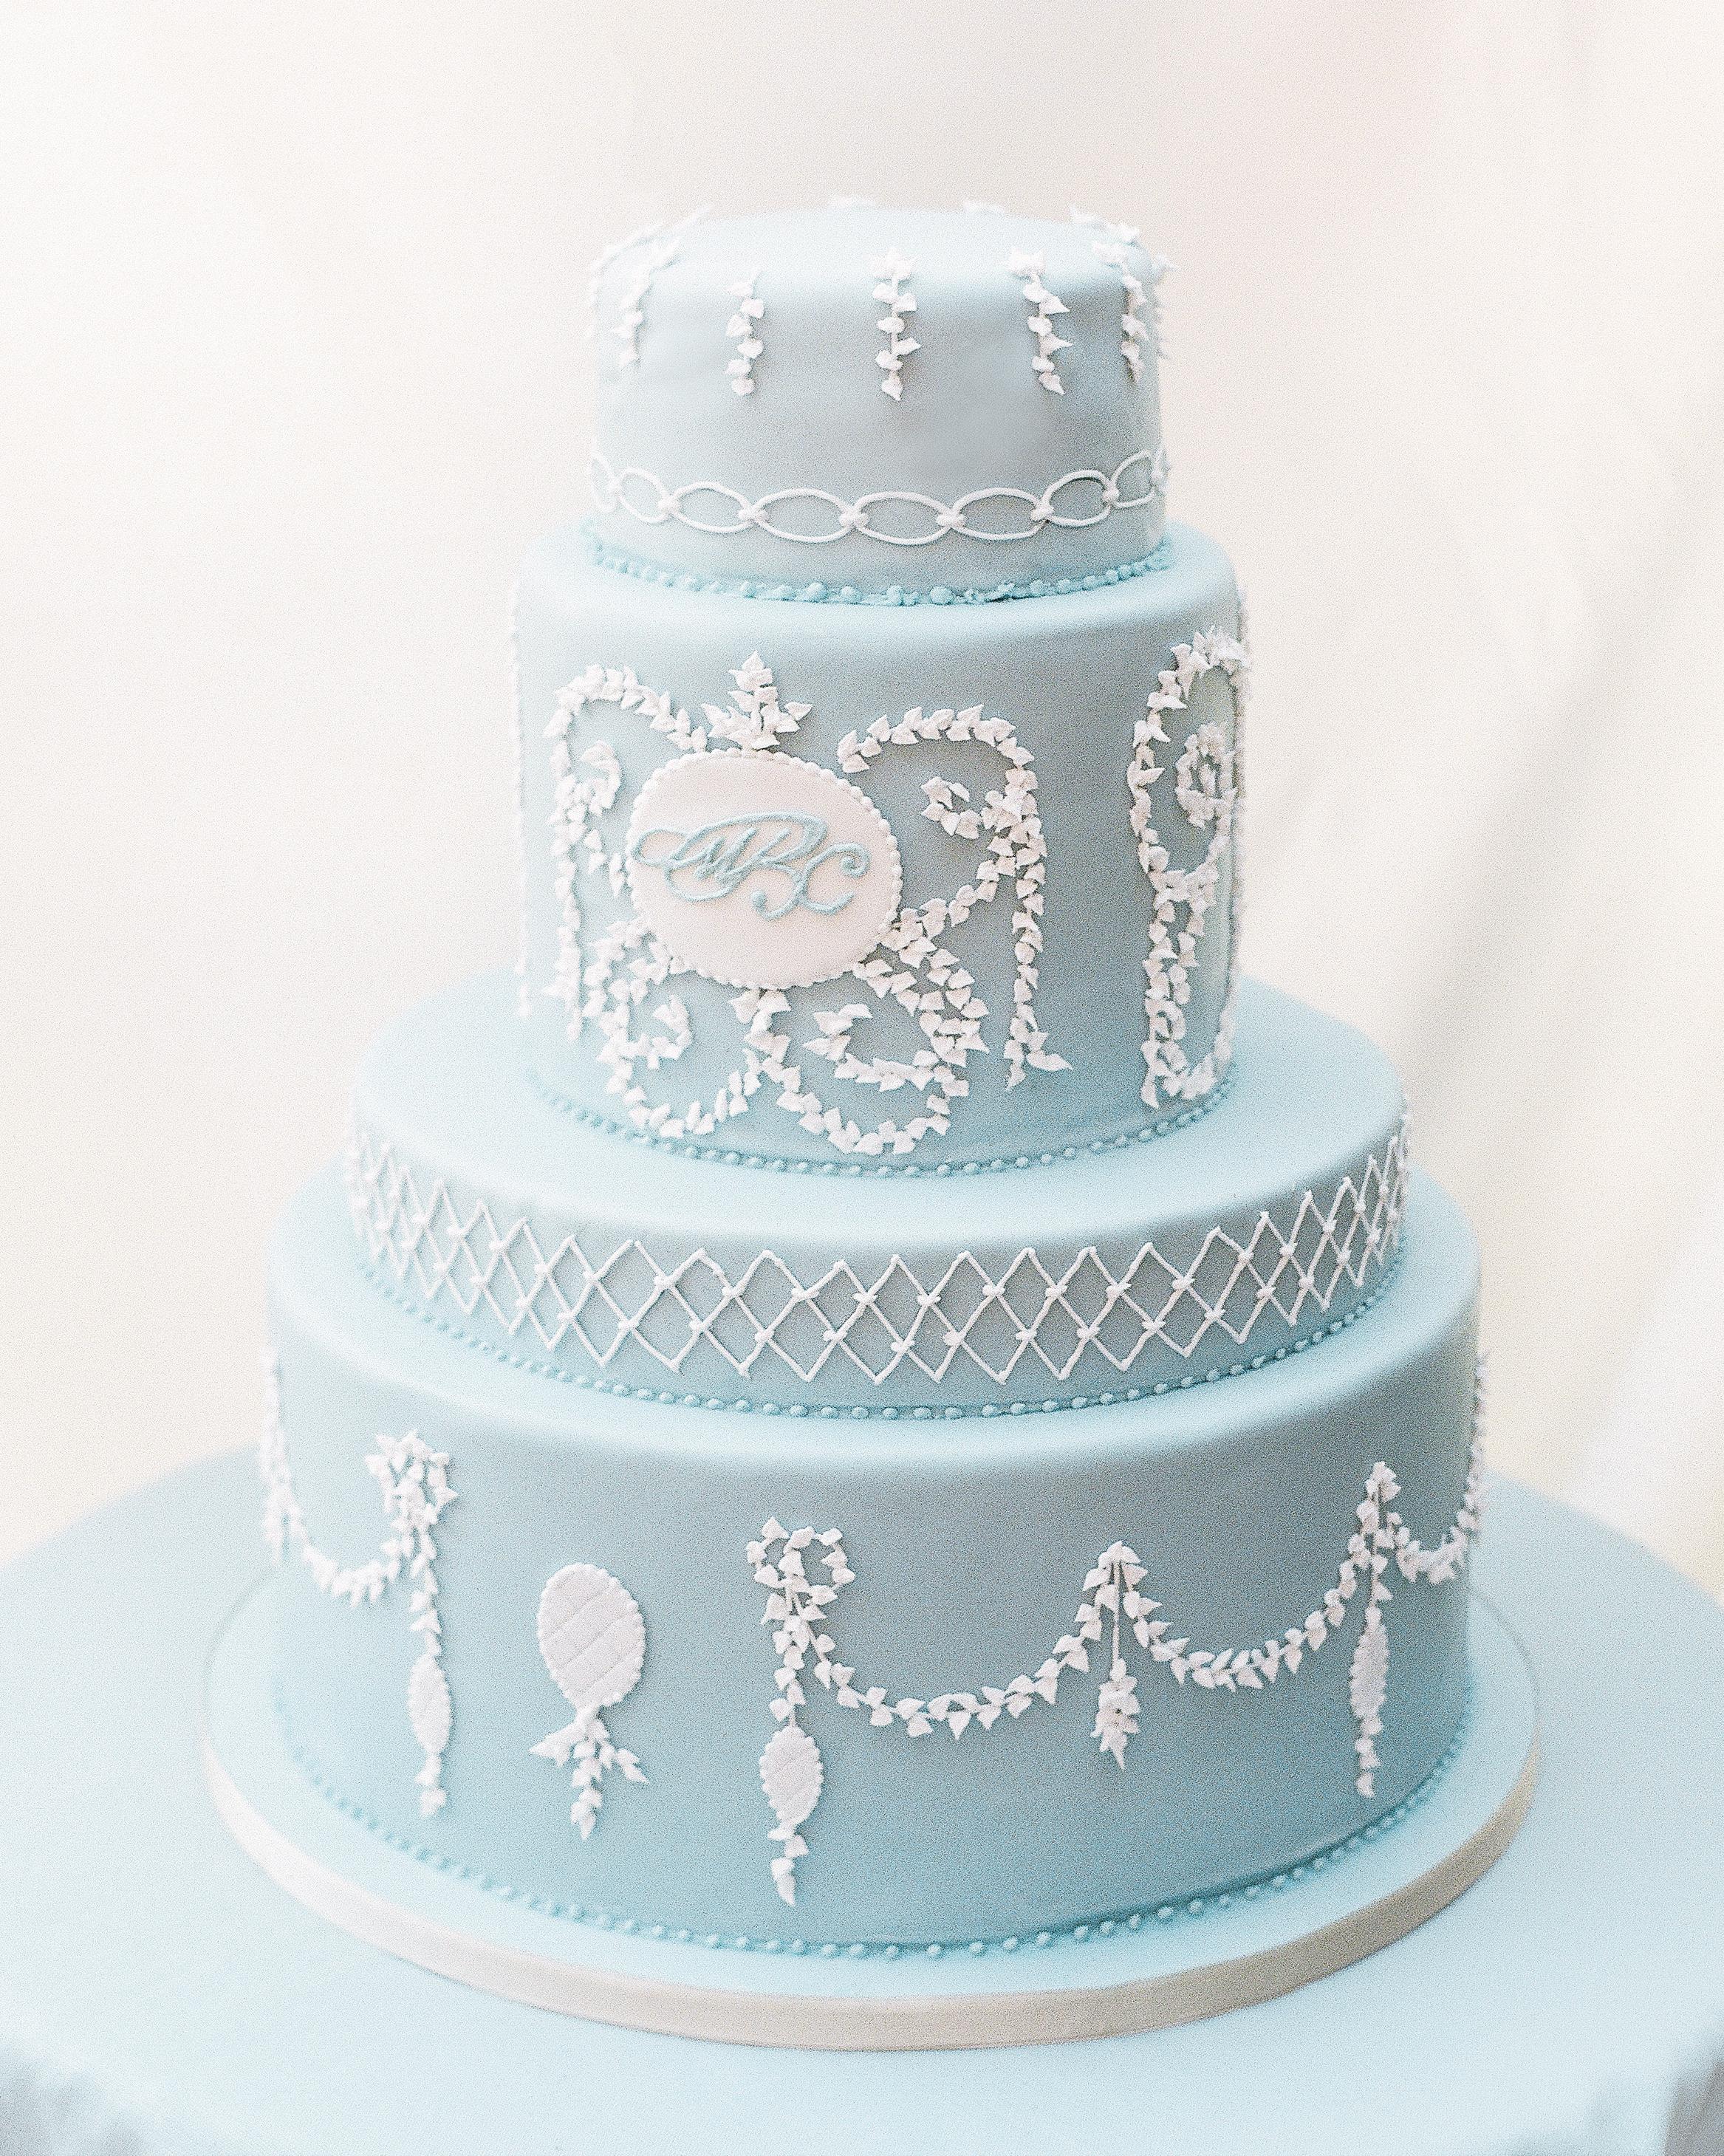 michelle-christopher-positano-reception-cake-details-0953-s111681.jpg